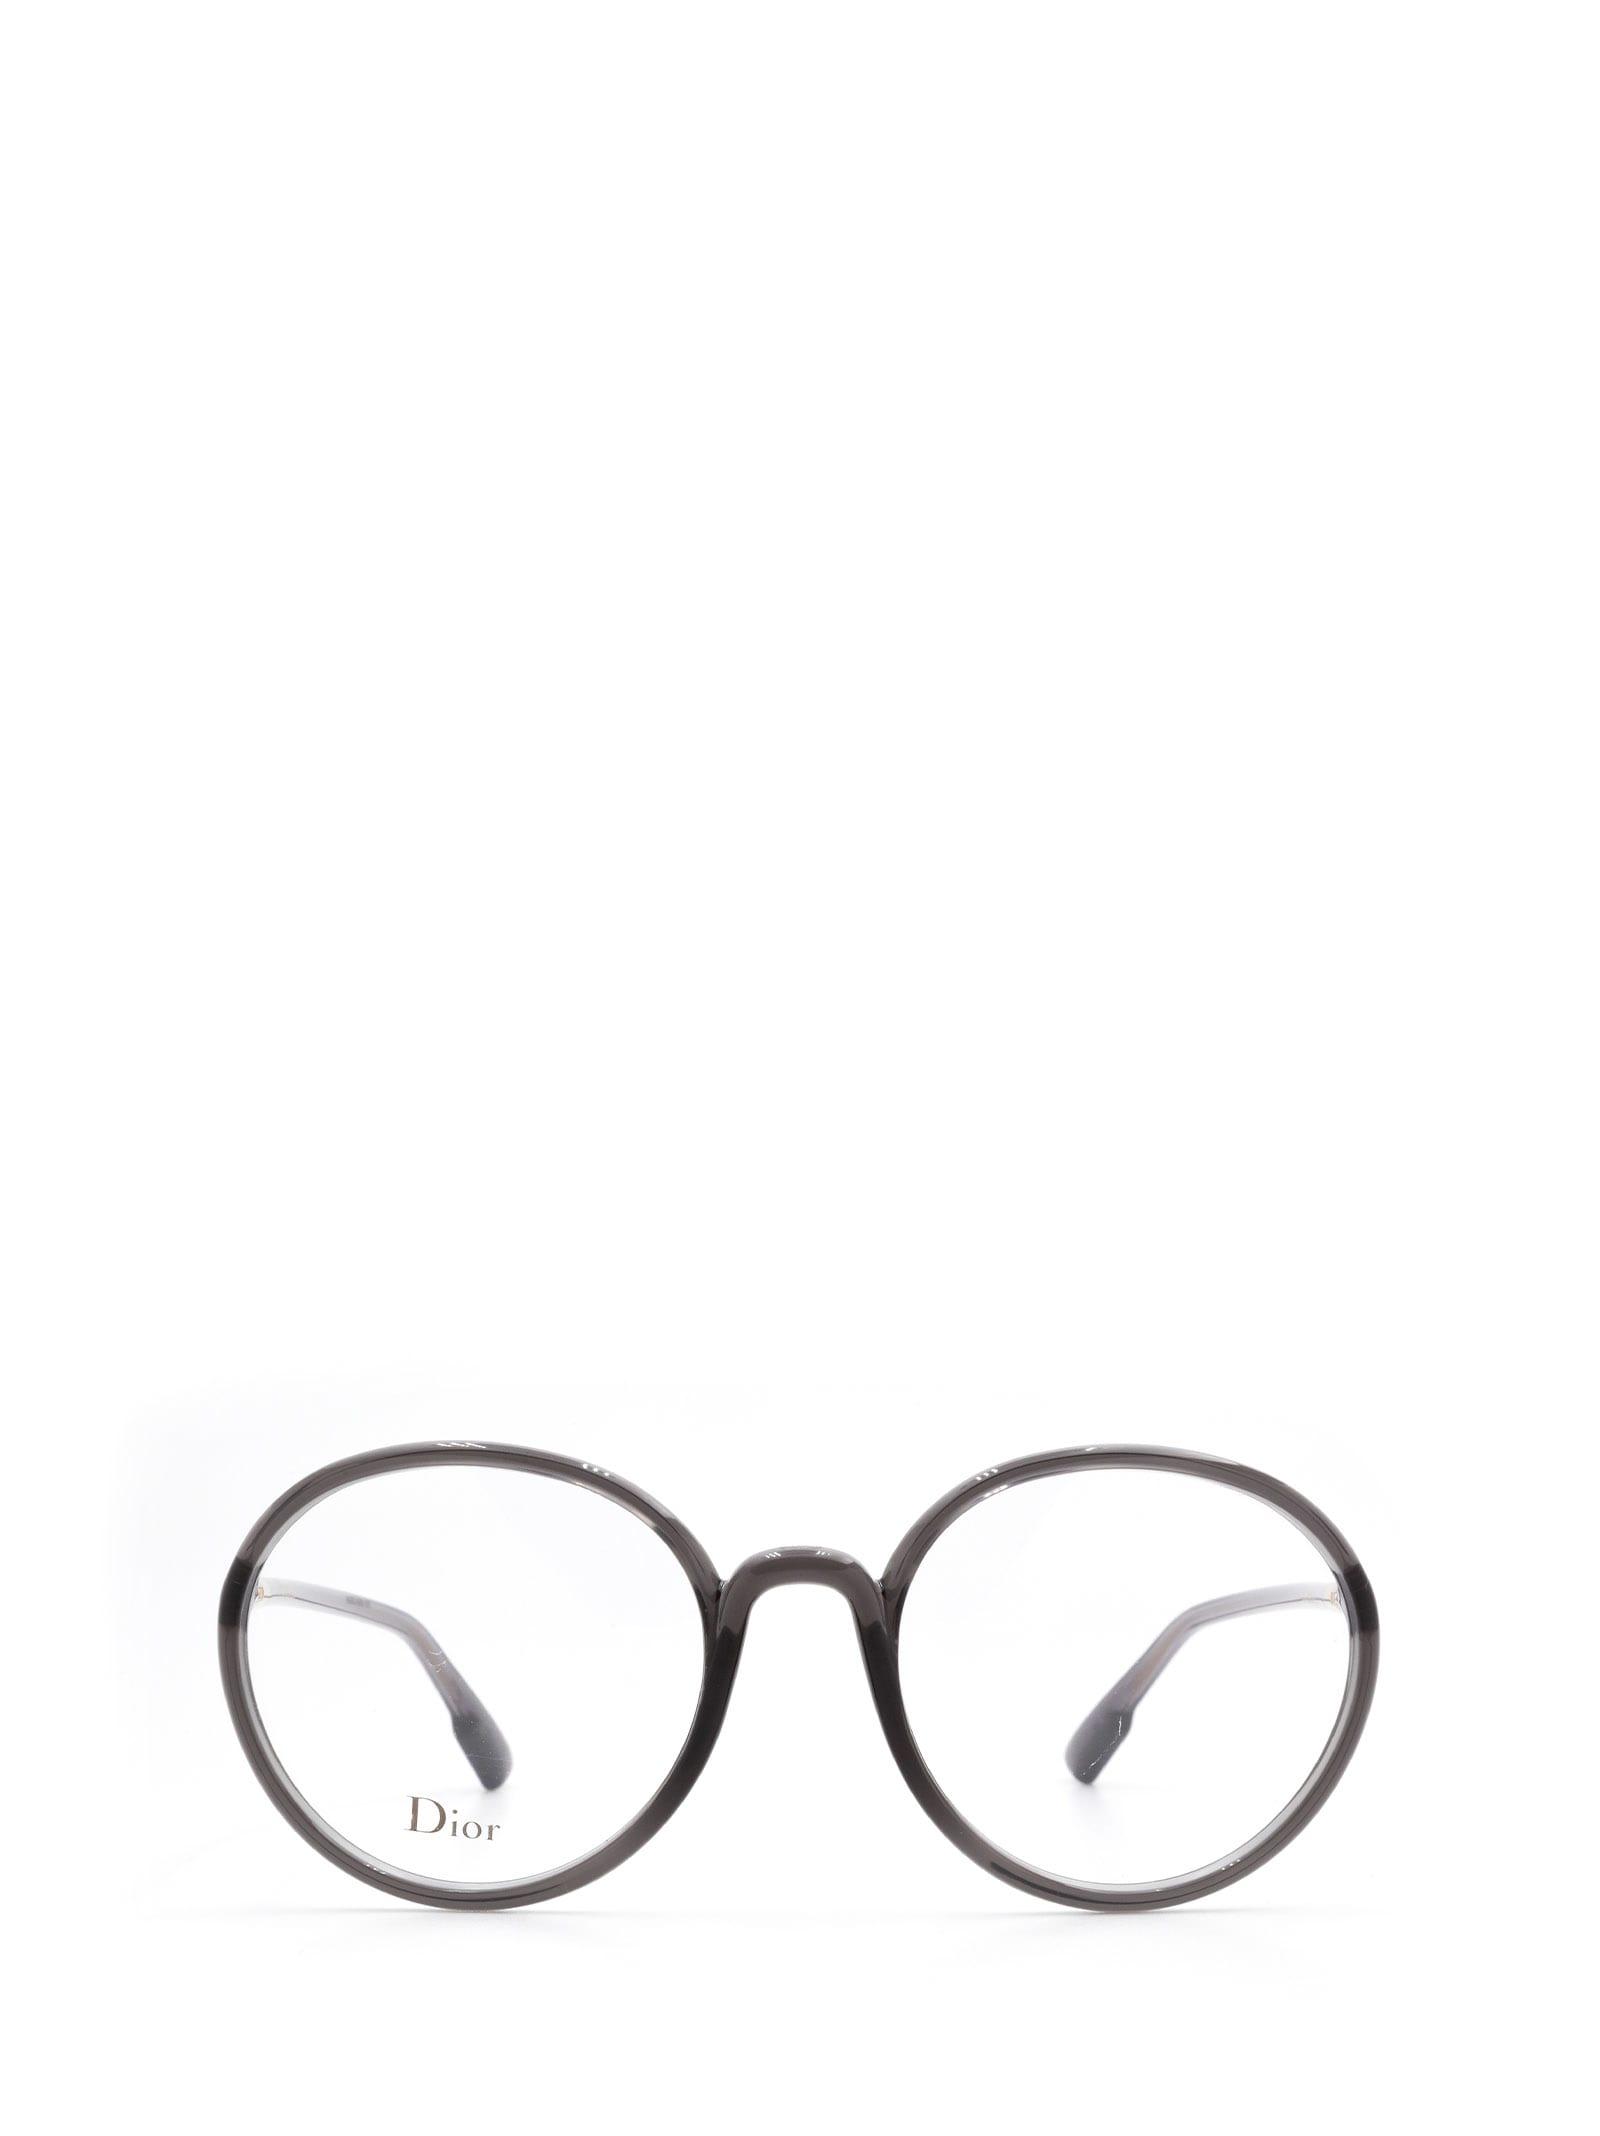 Dior SOSTELLAIREO2 KB7 GLASSES